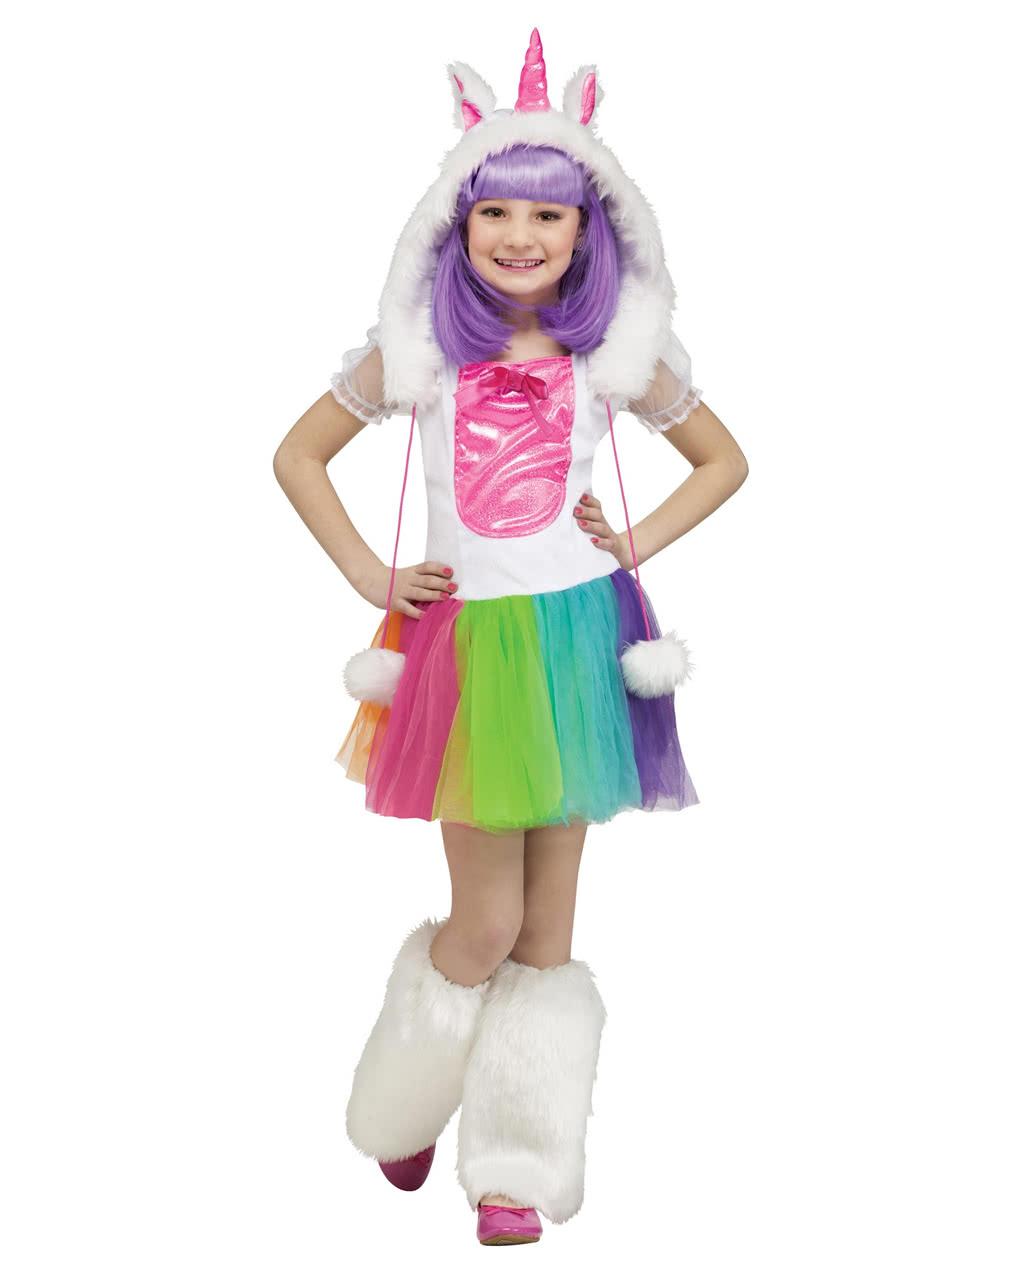 bb01ad13ae4f Fantasy Unicorn Children Costume fairytale Costume | horror-shop.com